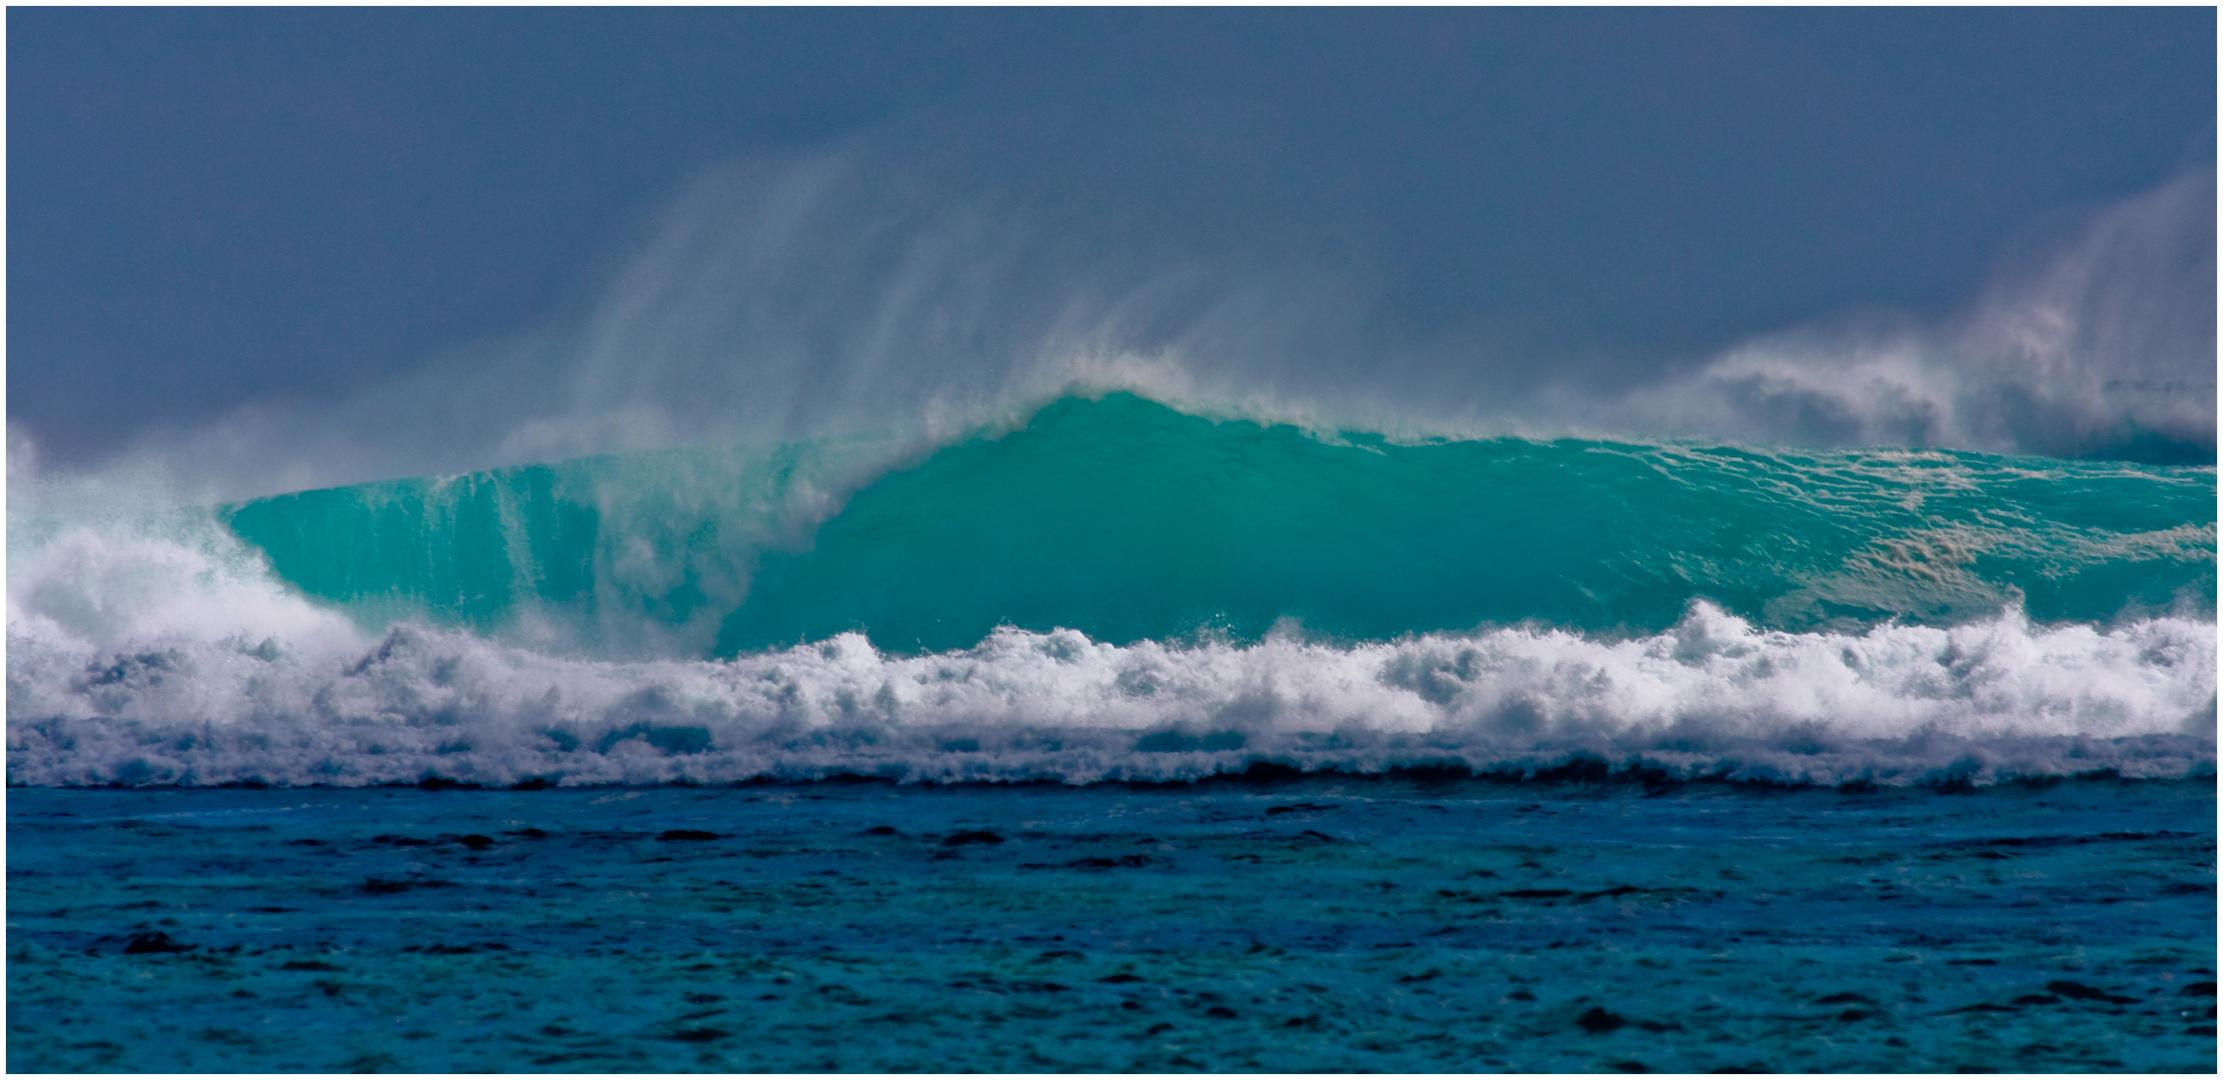 Big Wave @ One Eye, Le Morne, Mauritius